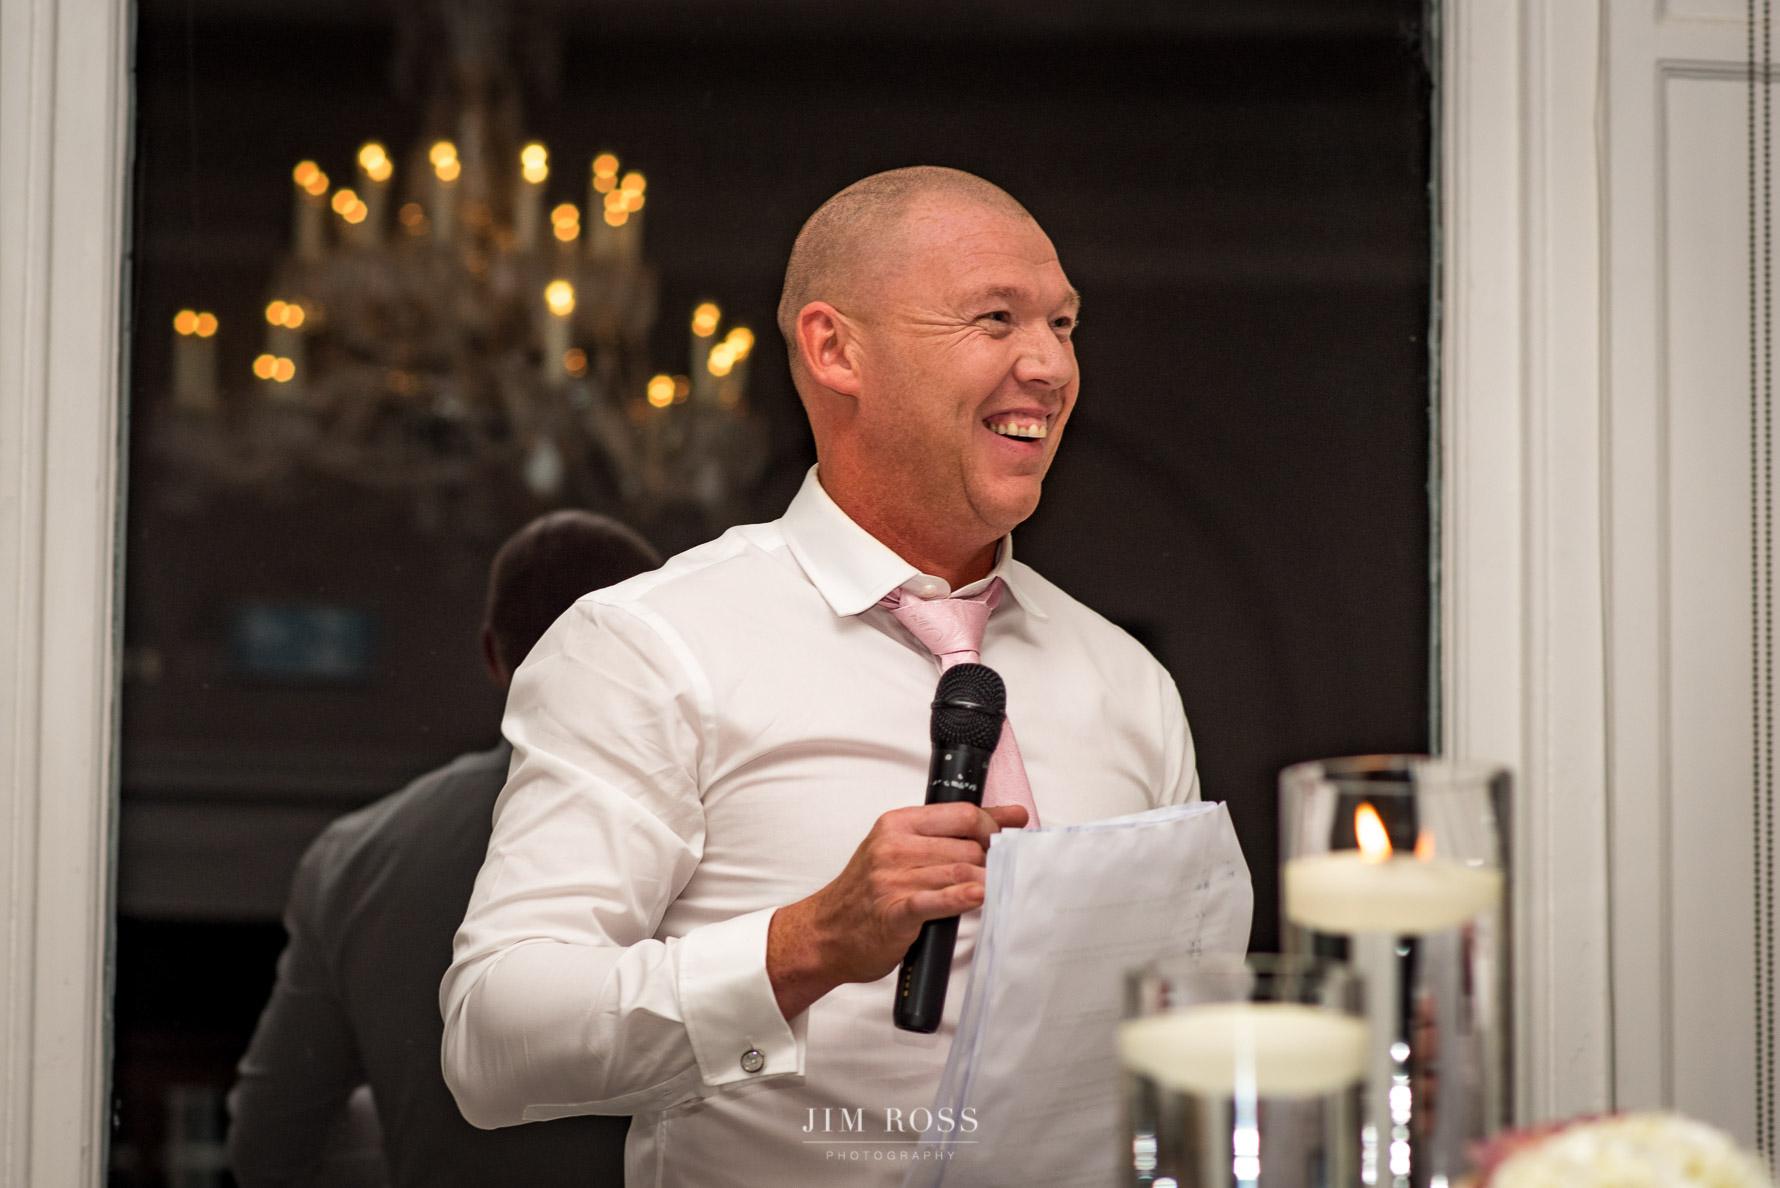 Groom feeling confident in his speech